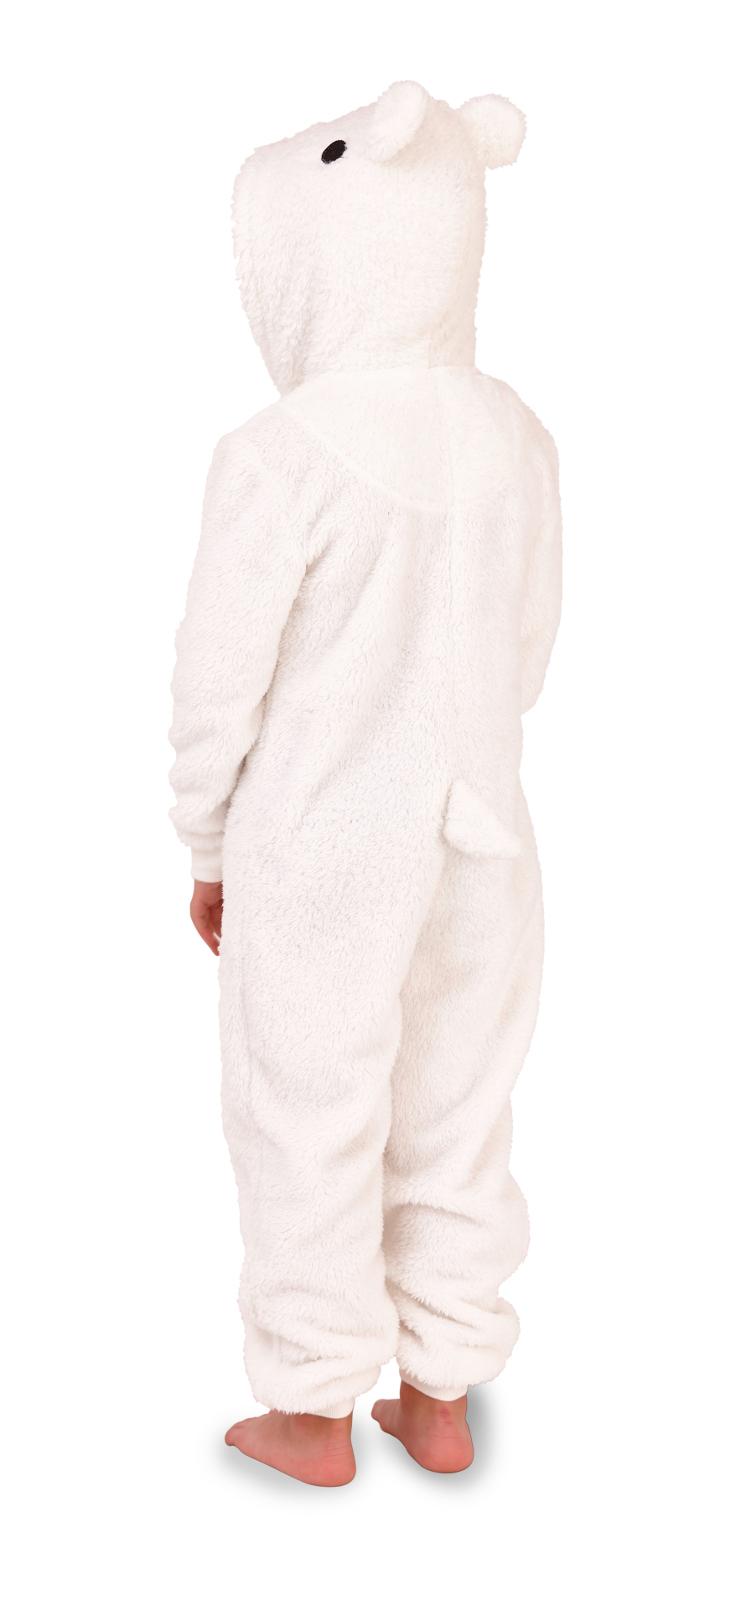 Boys Novelty Onezee Dress Up All In One Fleece Animal Character Pjs Kids